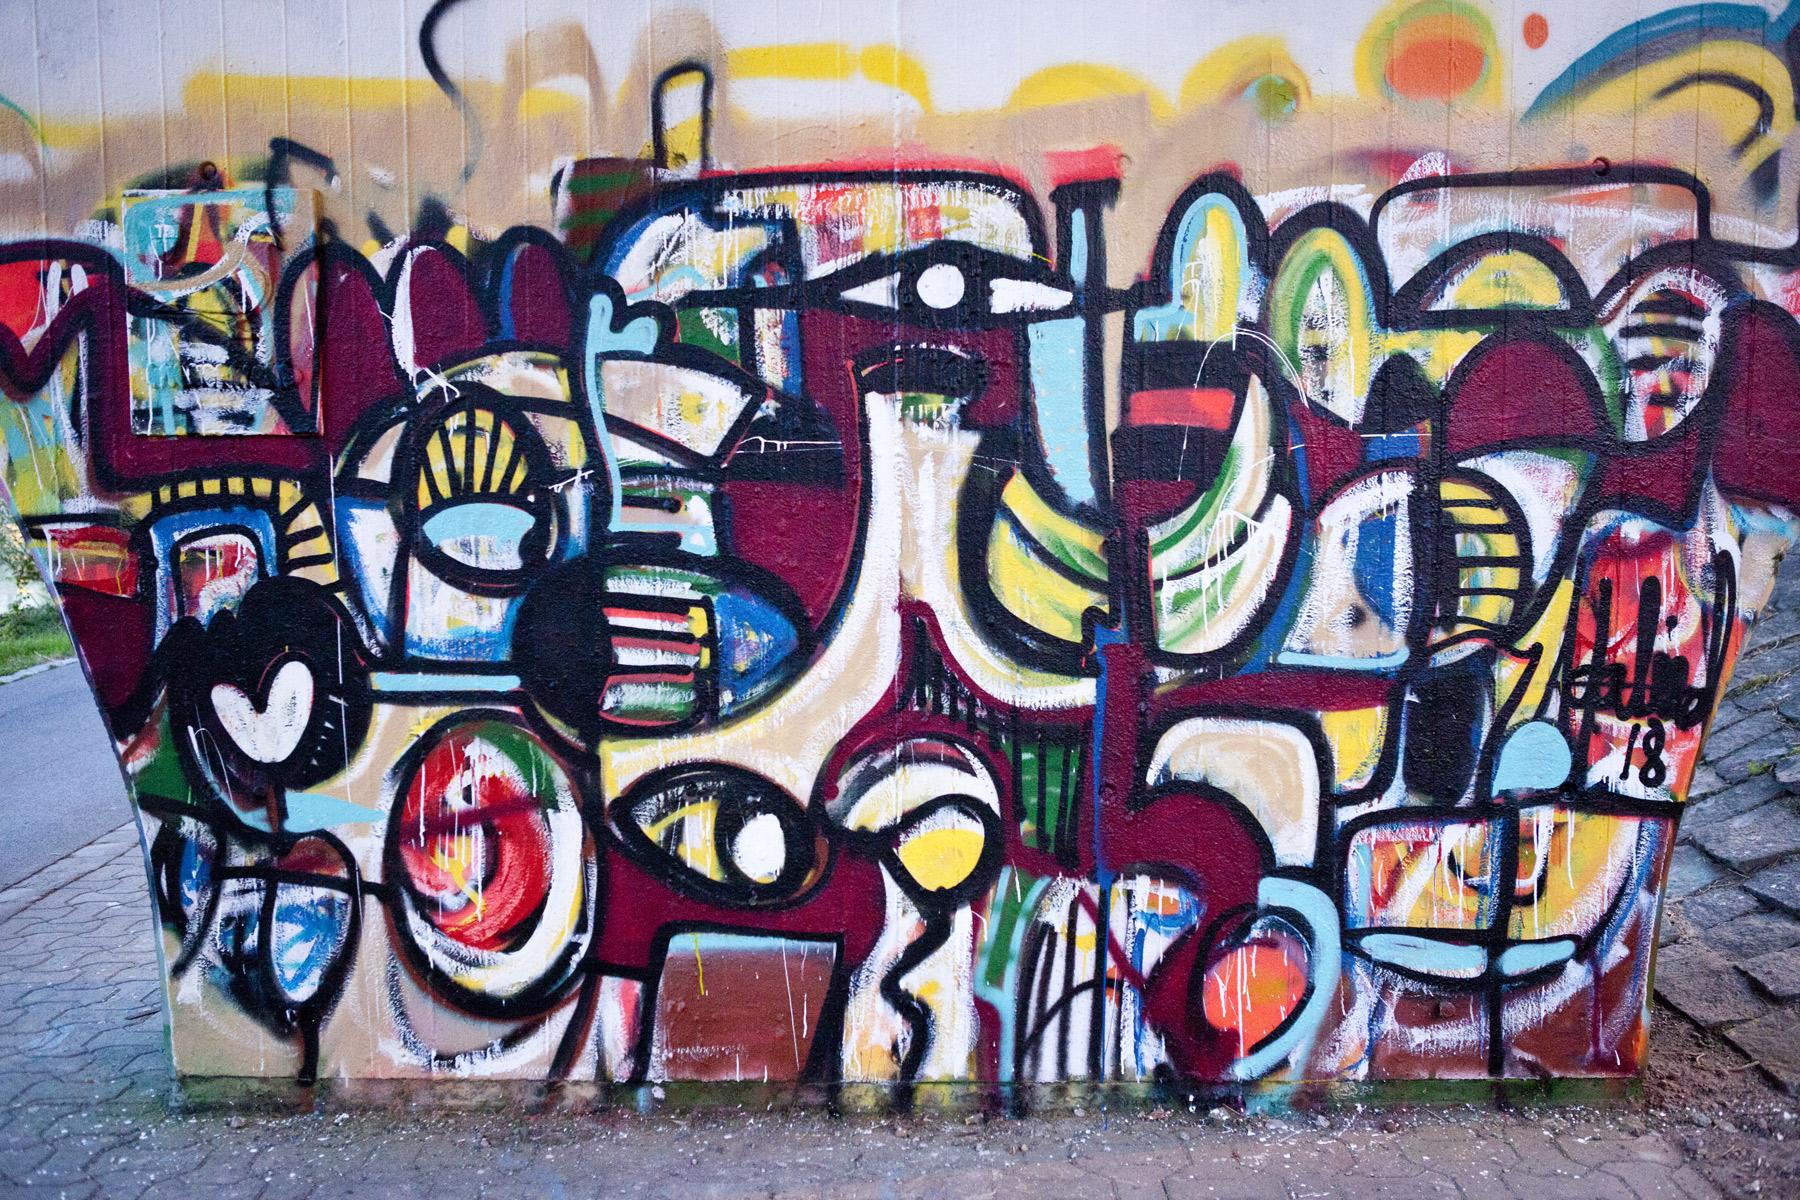 Rob_Adalierd_Painting_Vienna_Abstract_Contemporary_Street_art_thumb_3.jpg